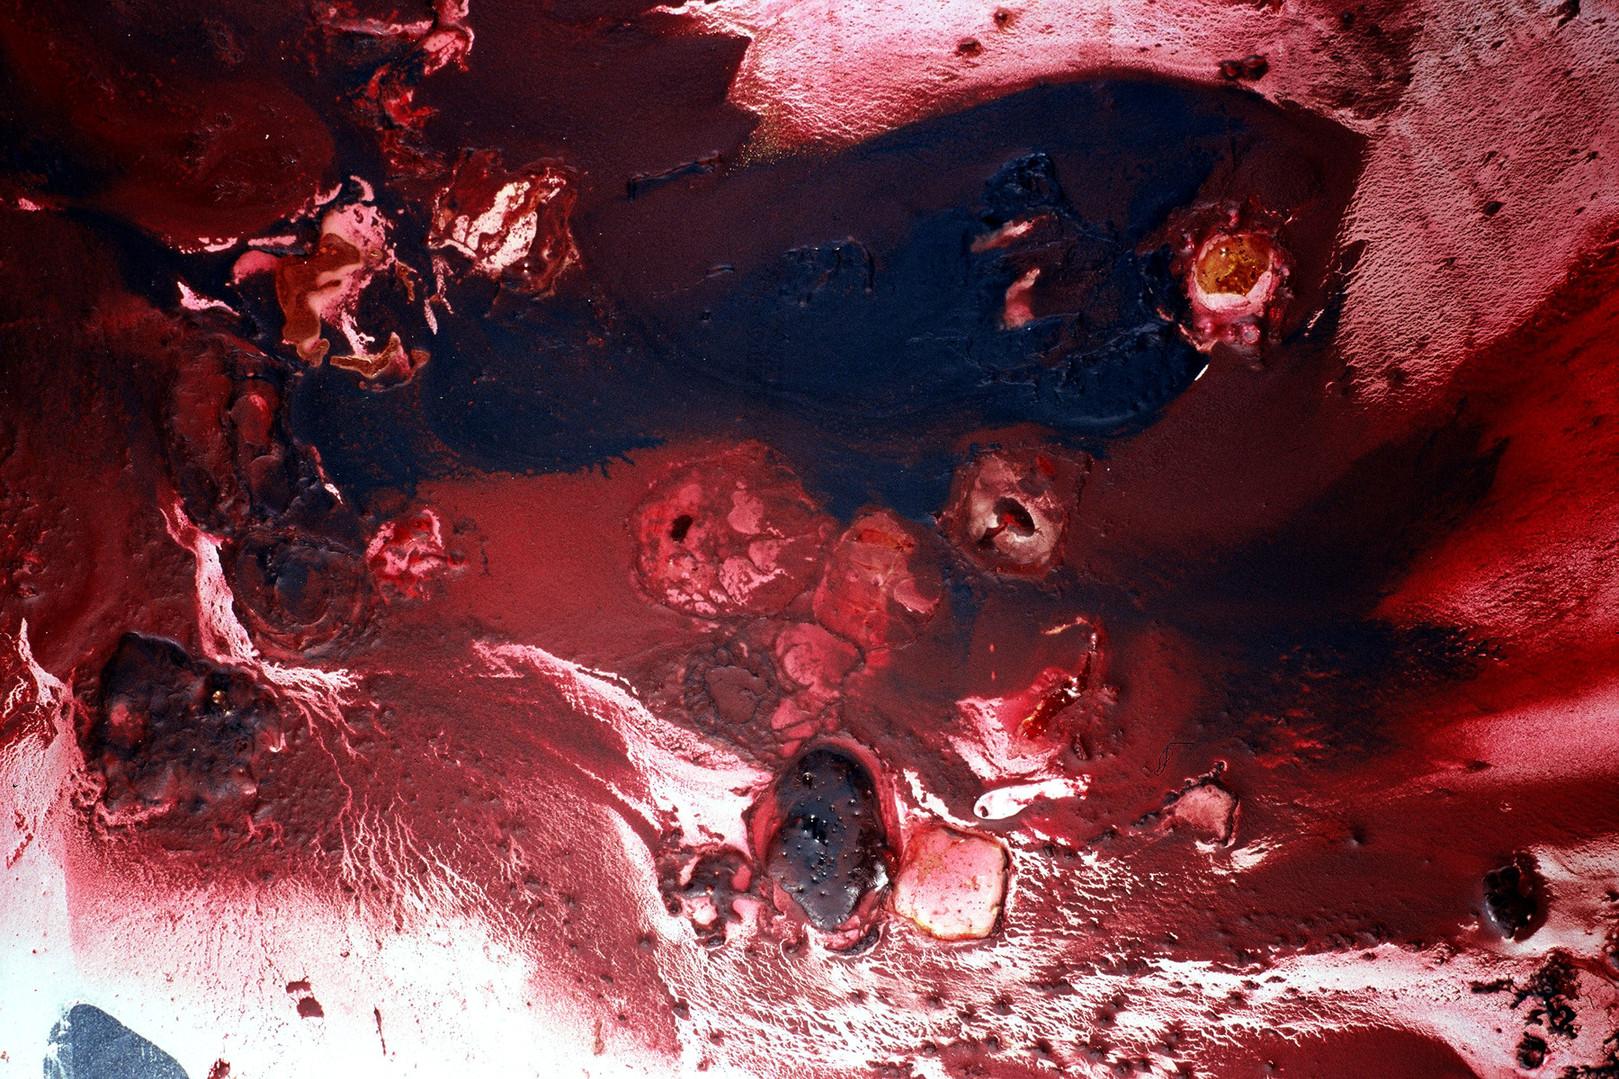 Corpa Delicata aftermath (detail)